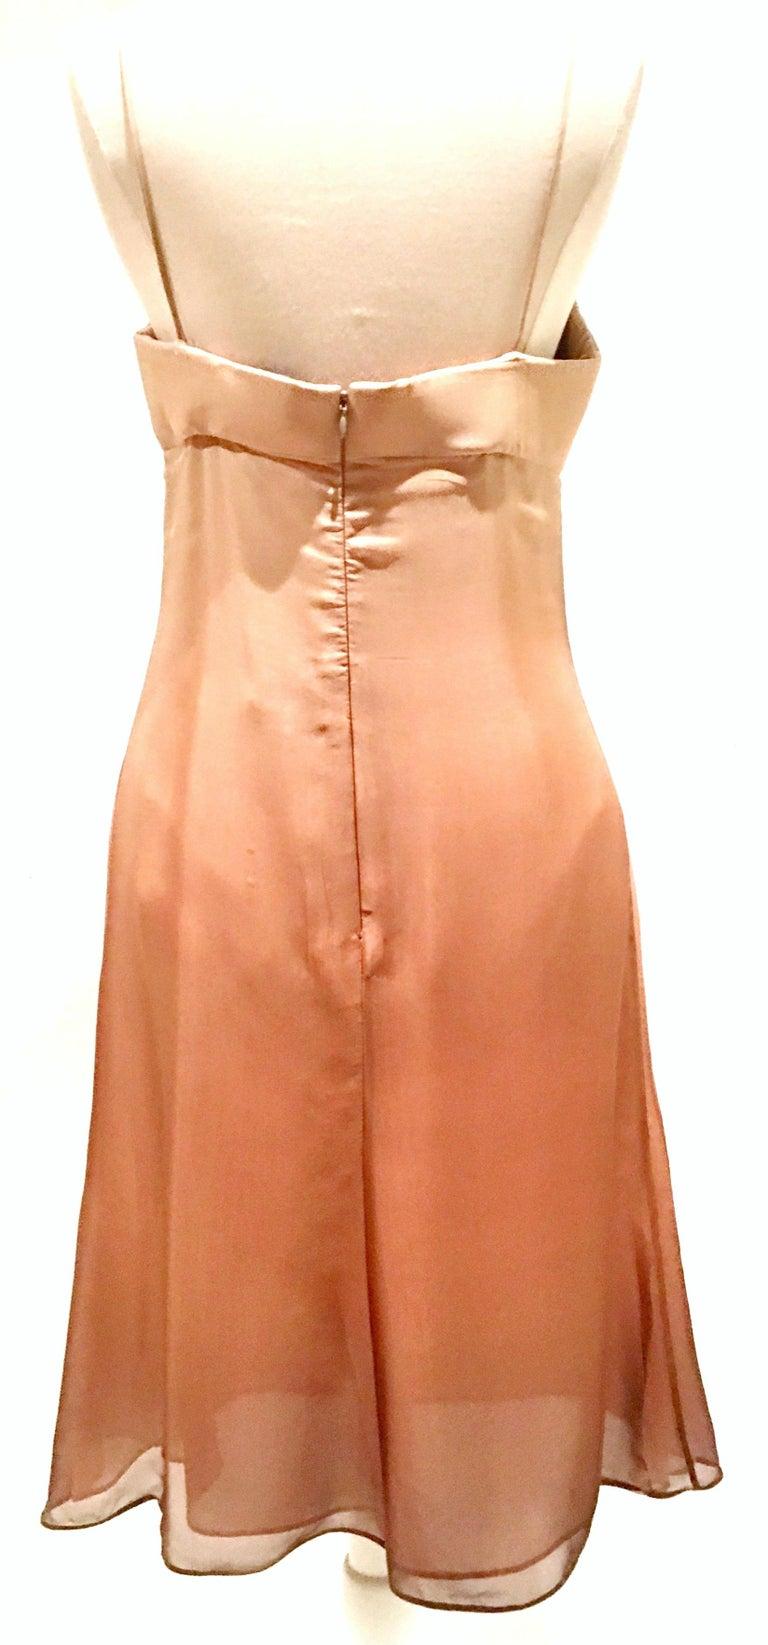 Women's or Men's 21st Century Italian Silk Chiffon Slip Dress By Girogio Armani - Size 42 For Sale